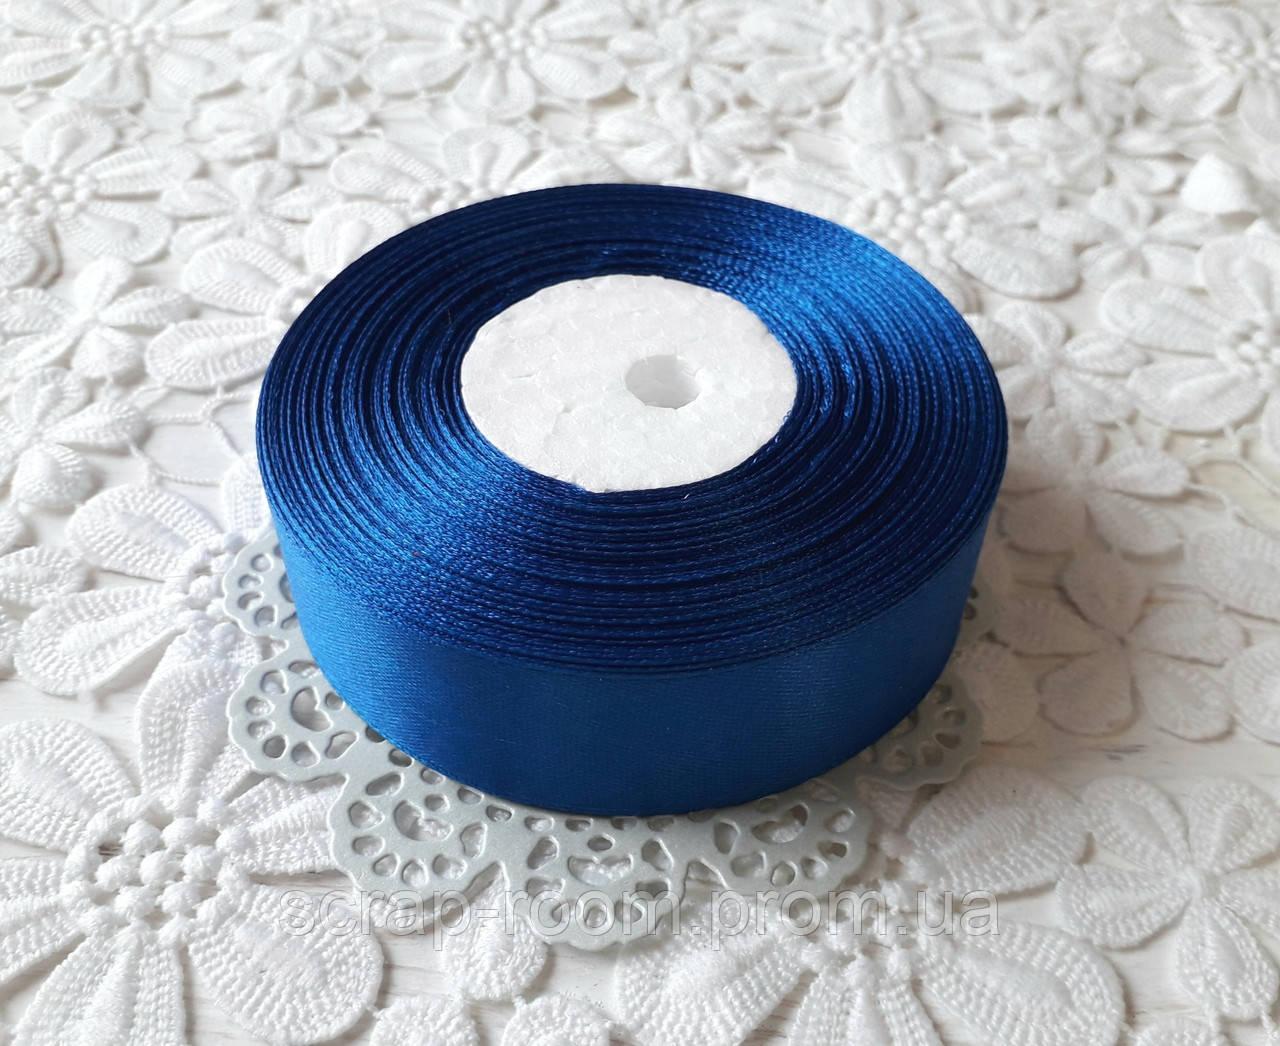 Лента атласная 2,5 см темно-синяя, лента цвет темно-синий атлас, лента атласная синяя, цена за метр